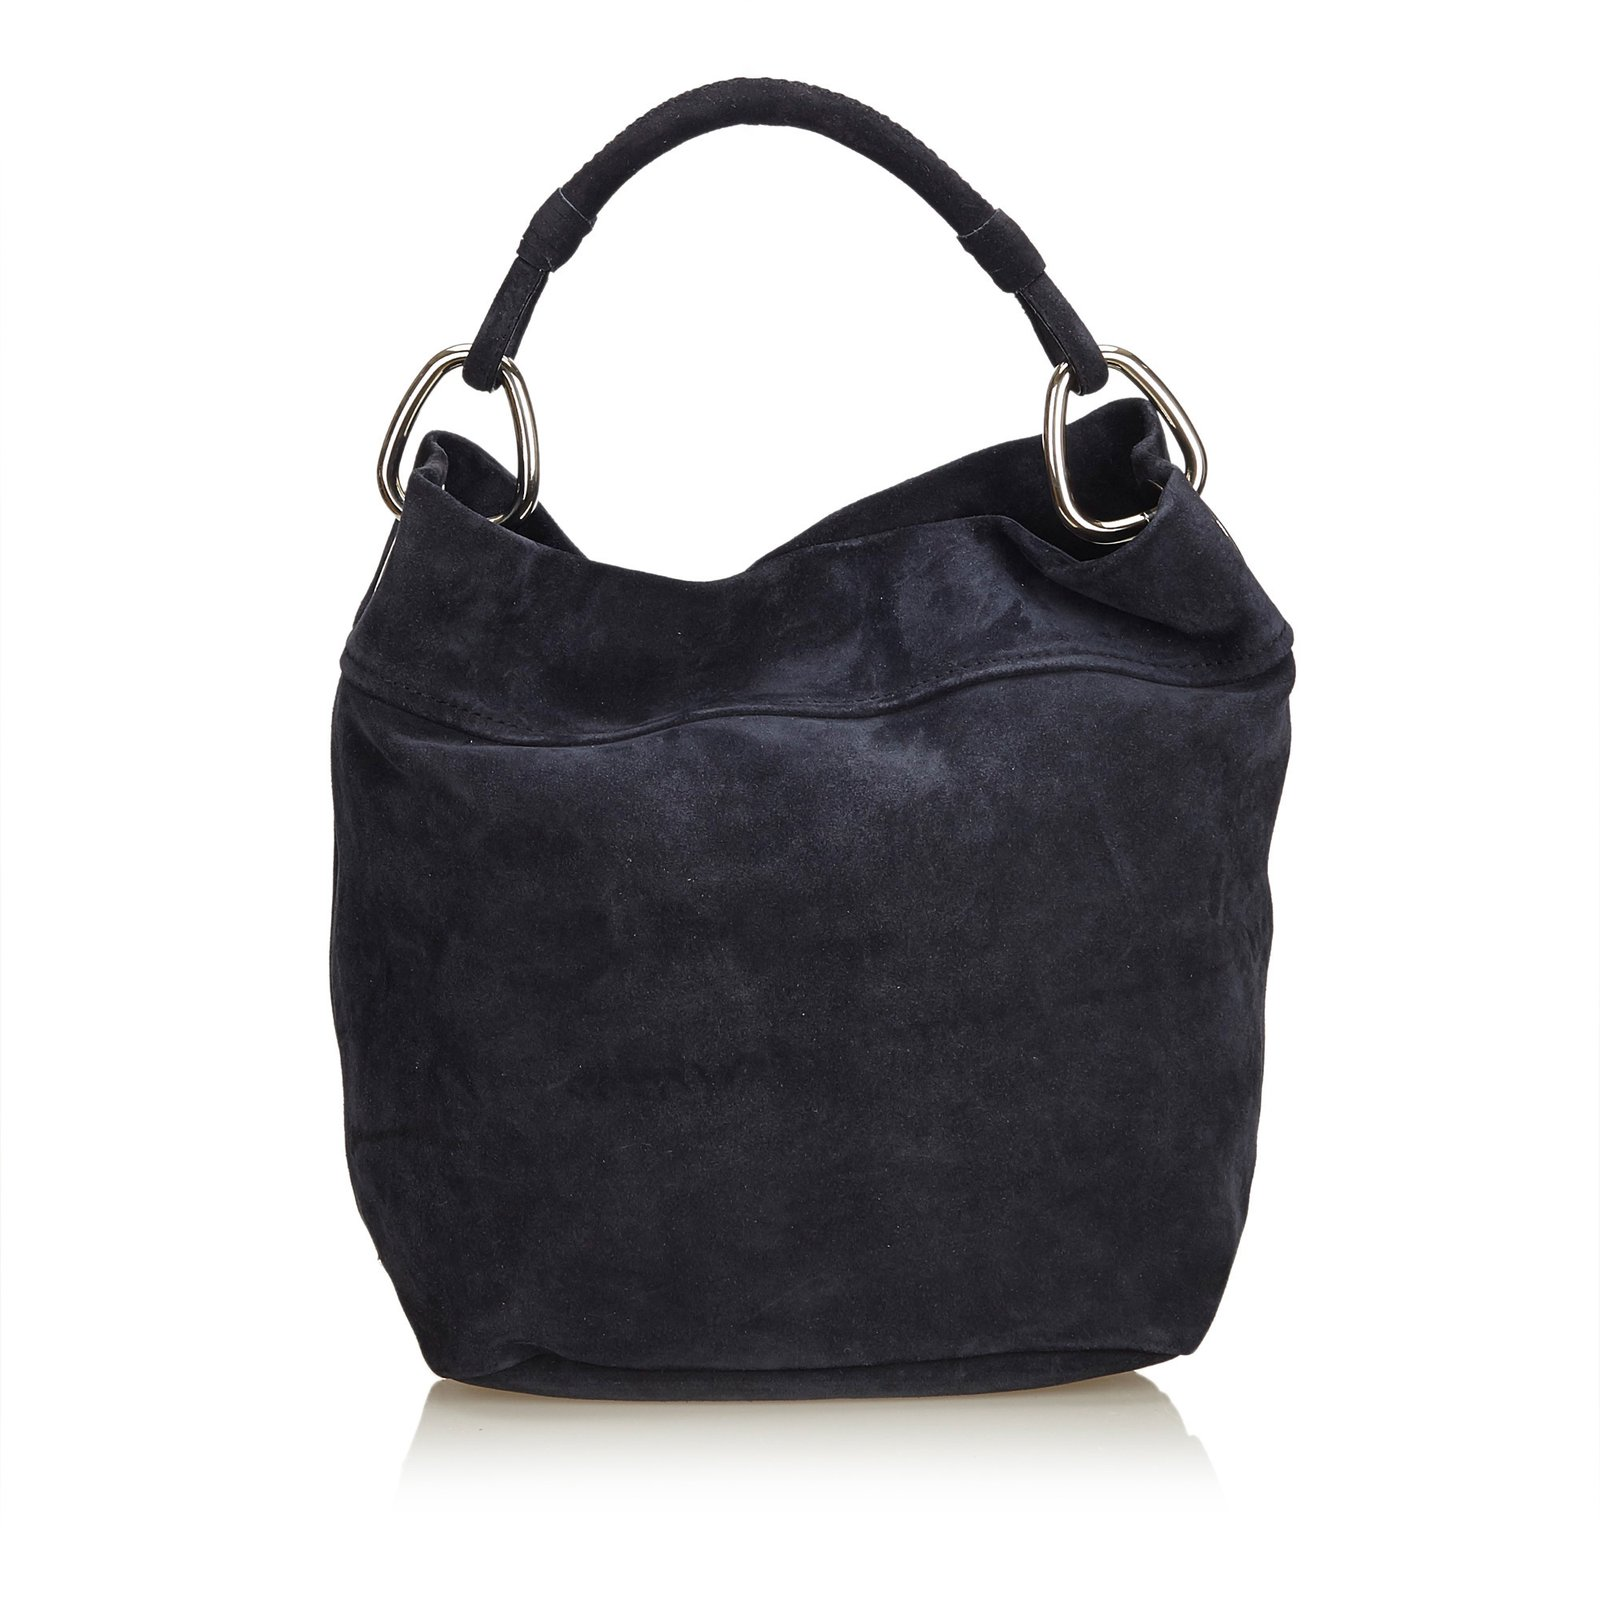 92ec74fb66a2 Prada Nubuck Hobo Handbags Leather,Other Blue,Navy blue ref.91331 ...